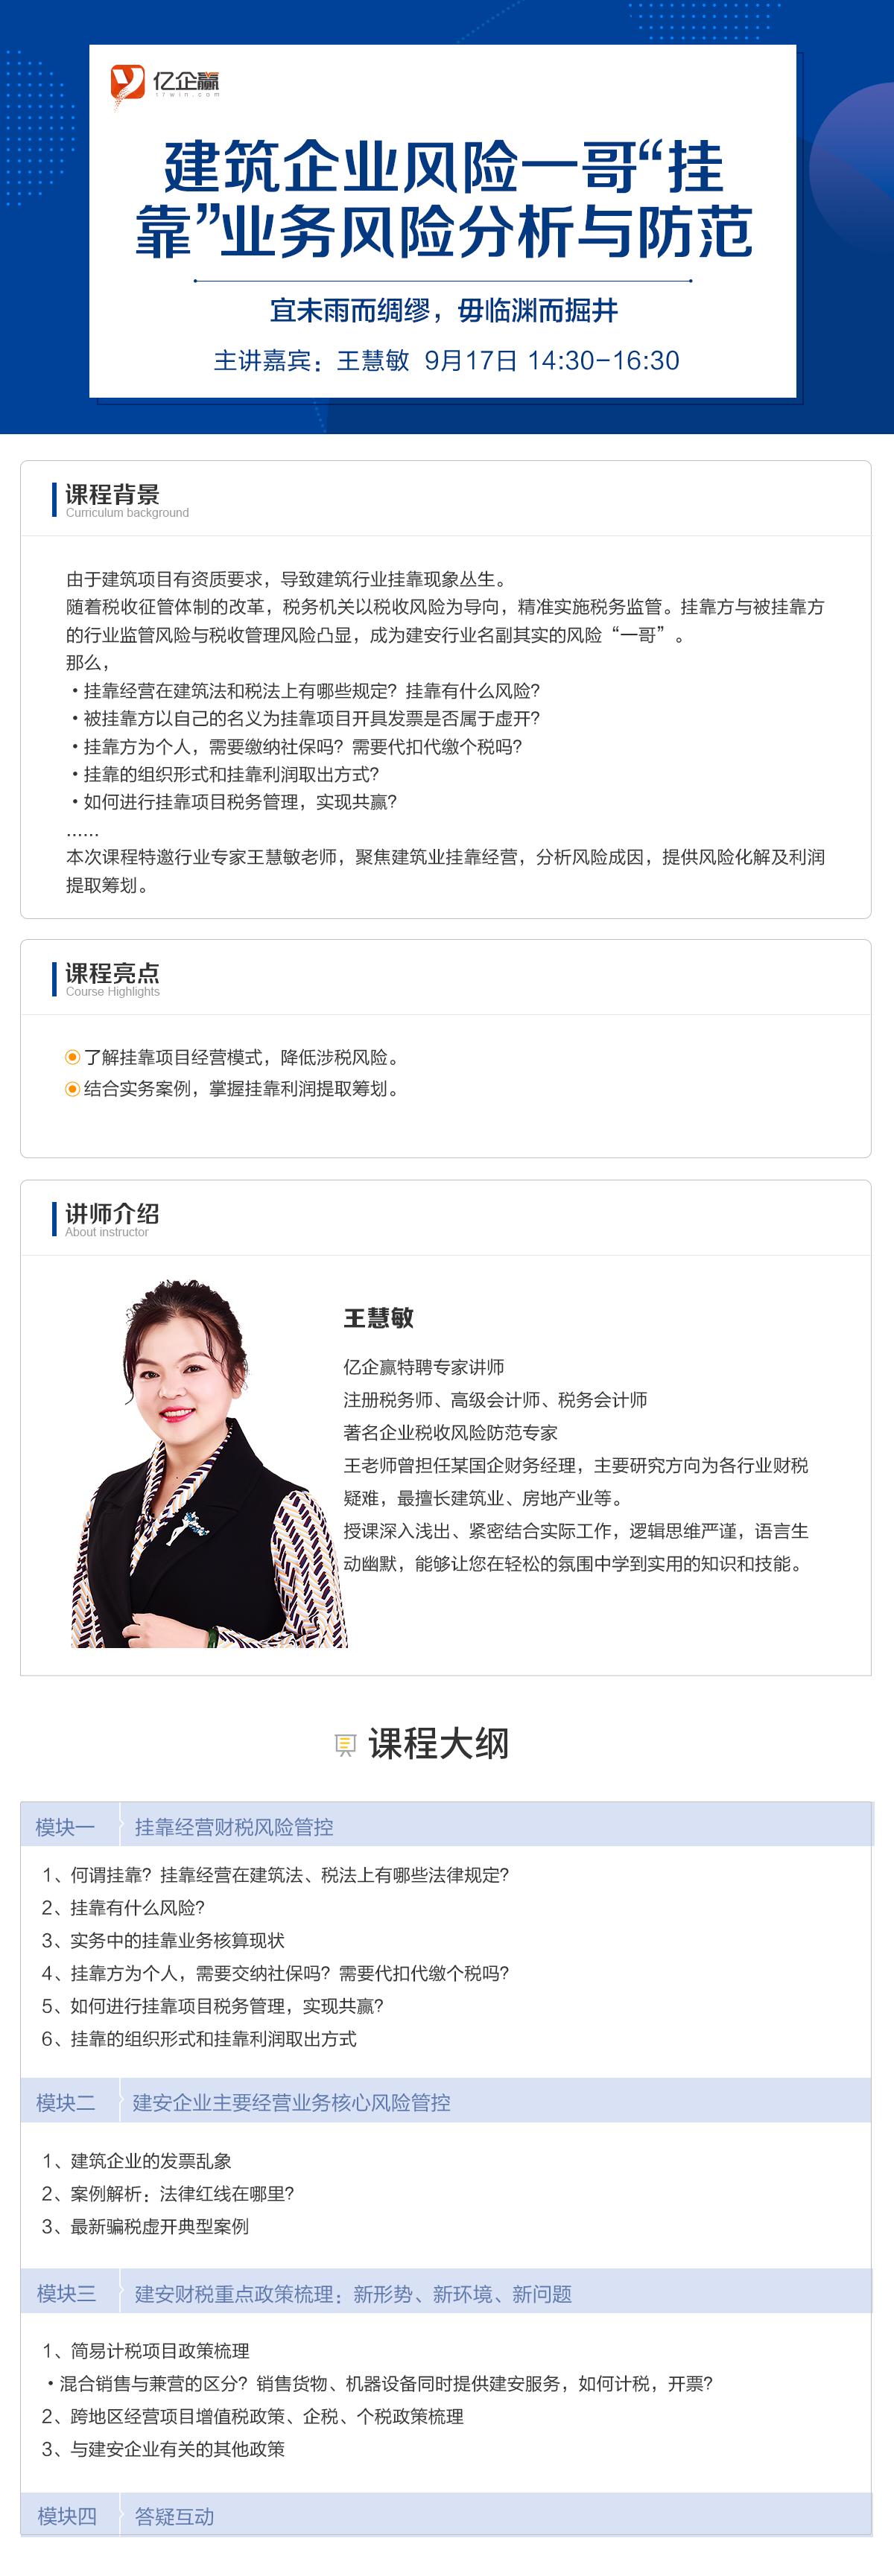 招生简章-pc.png